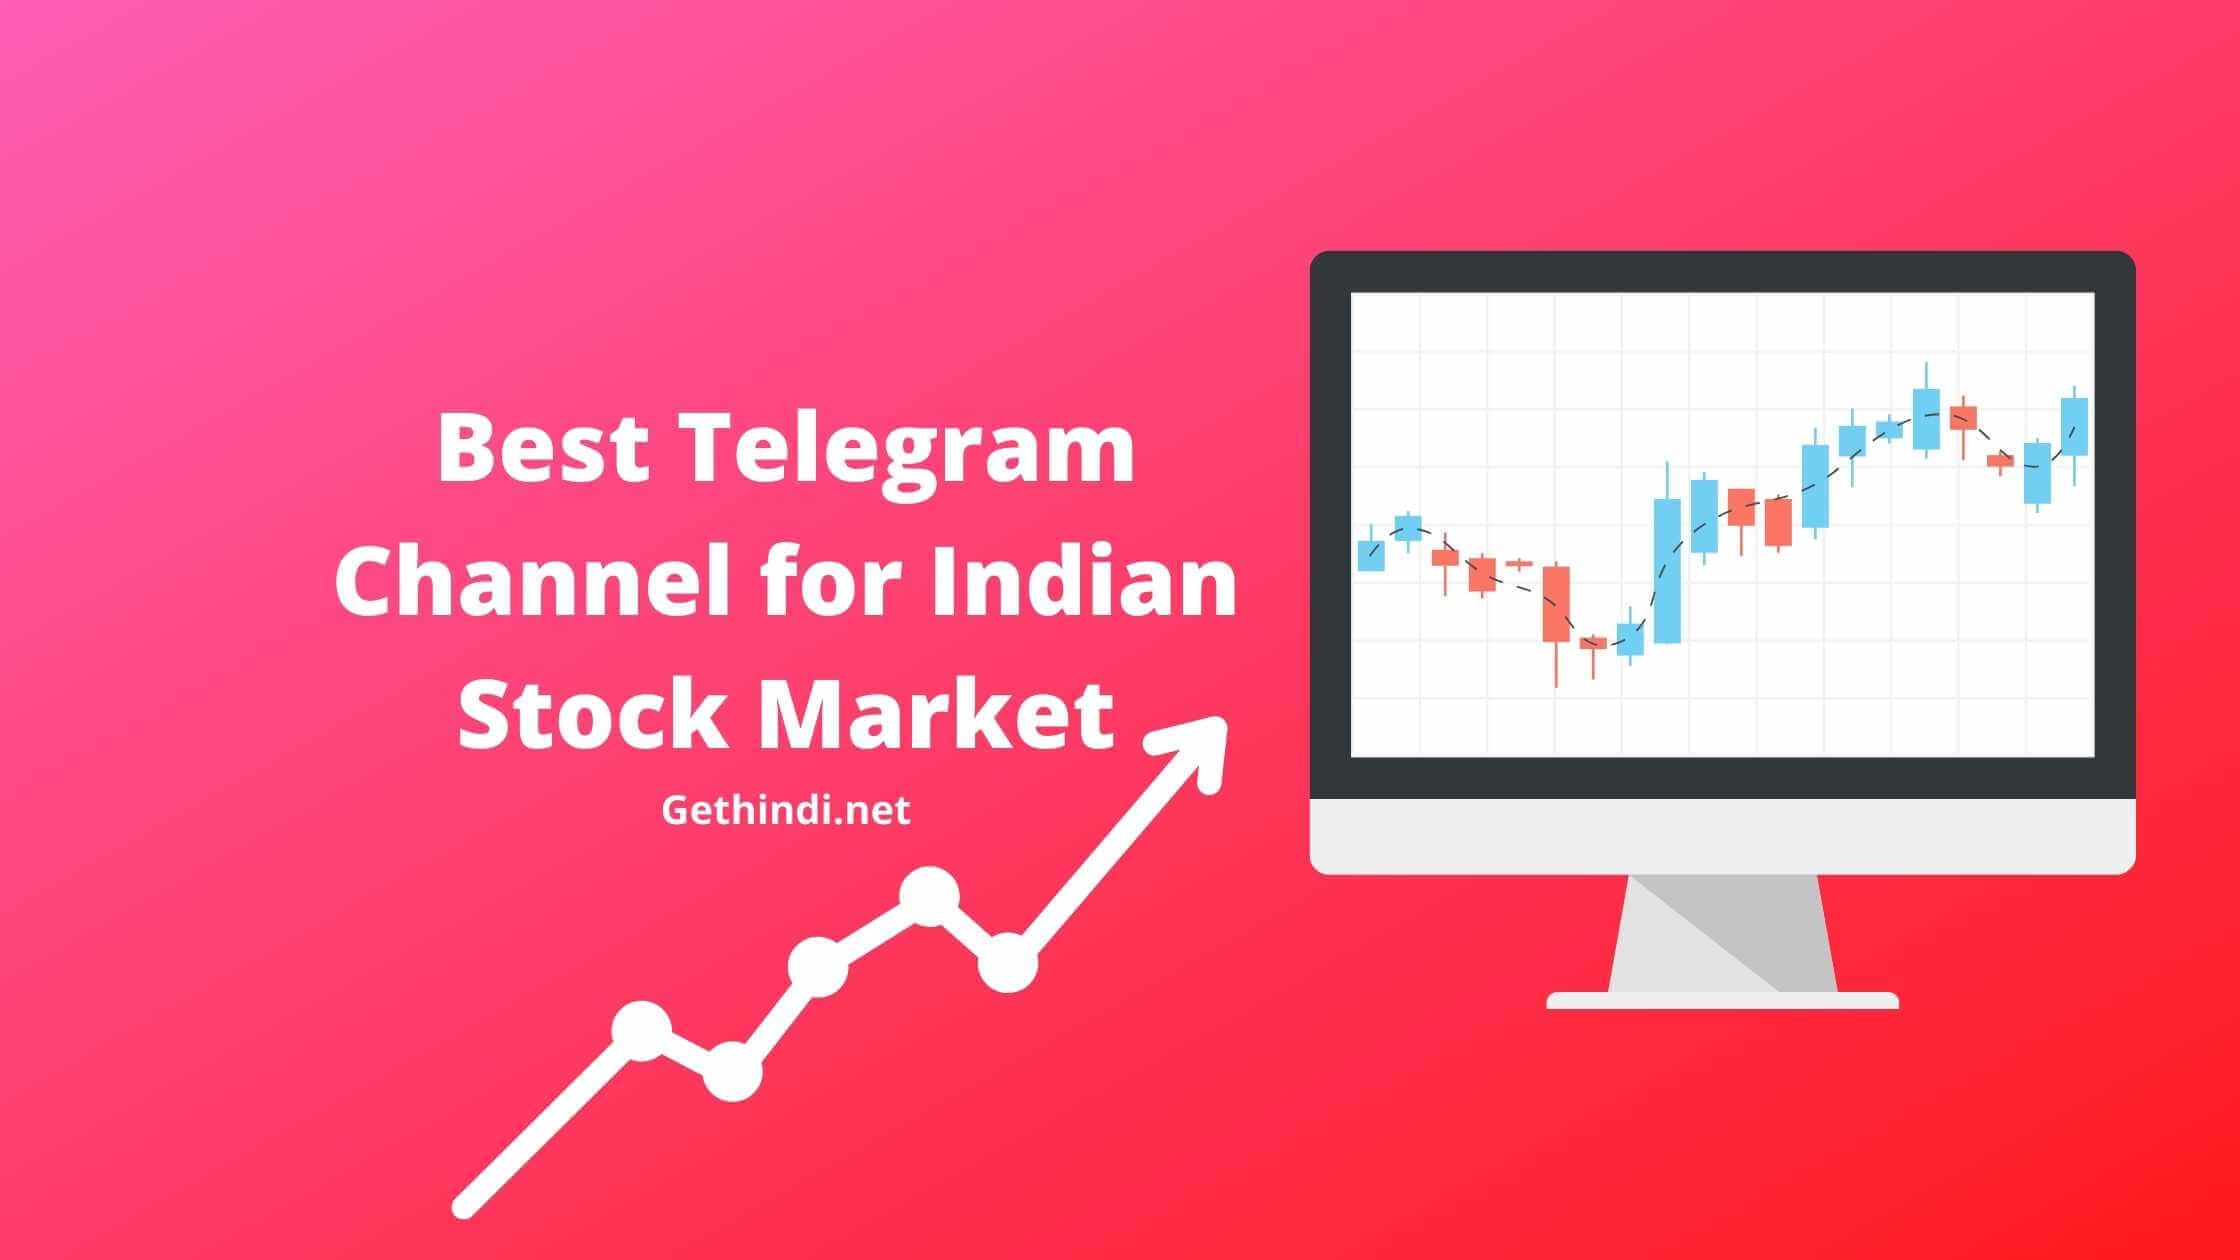 Best Telegram Channel for Indian Stock Market